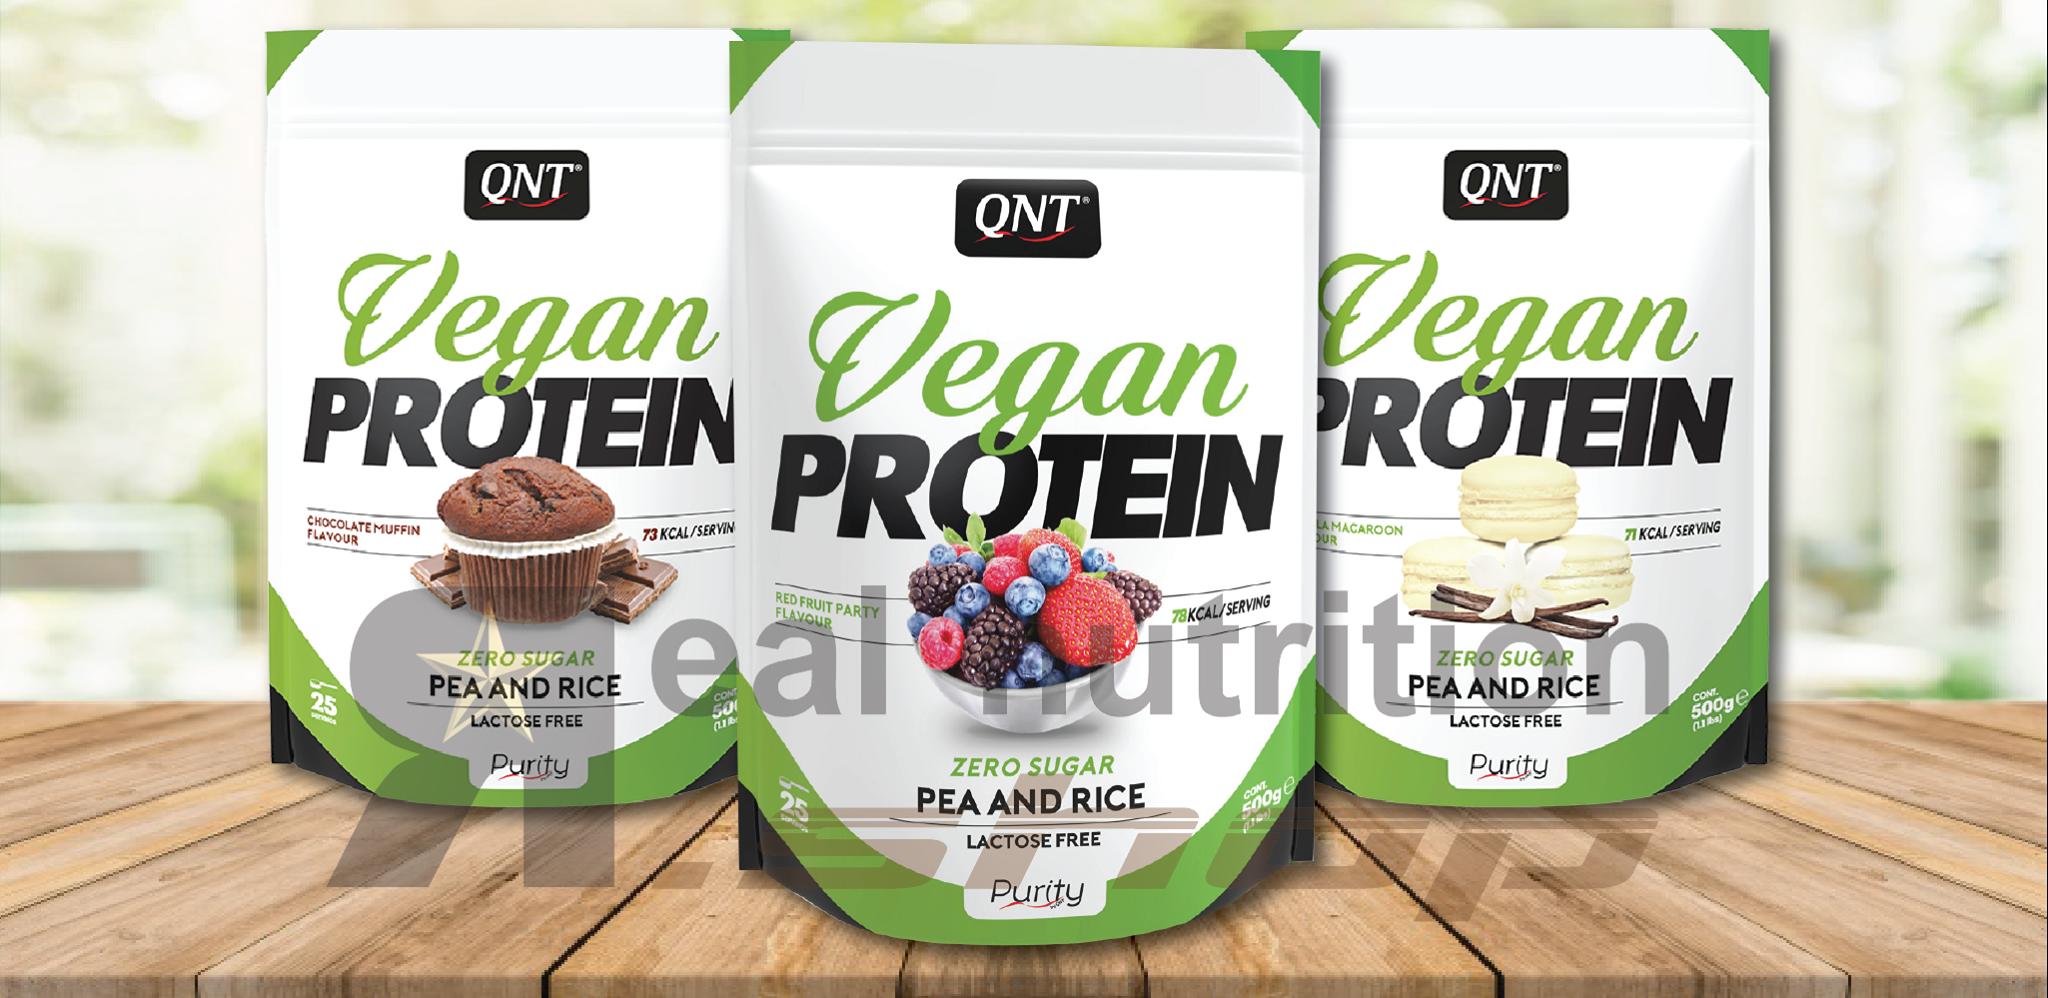 QNT Vegan Protein banner - Real Nutrition Shop